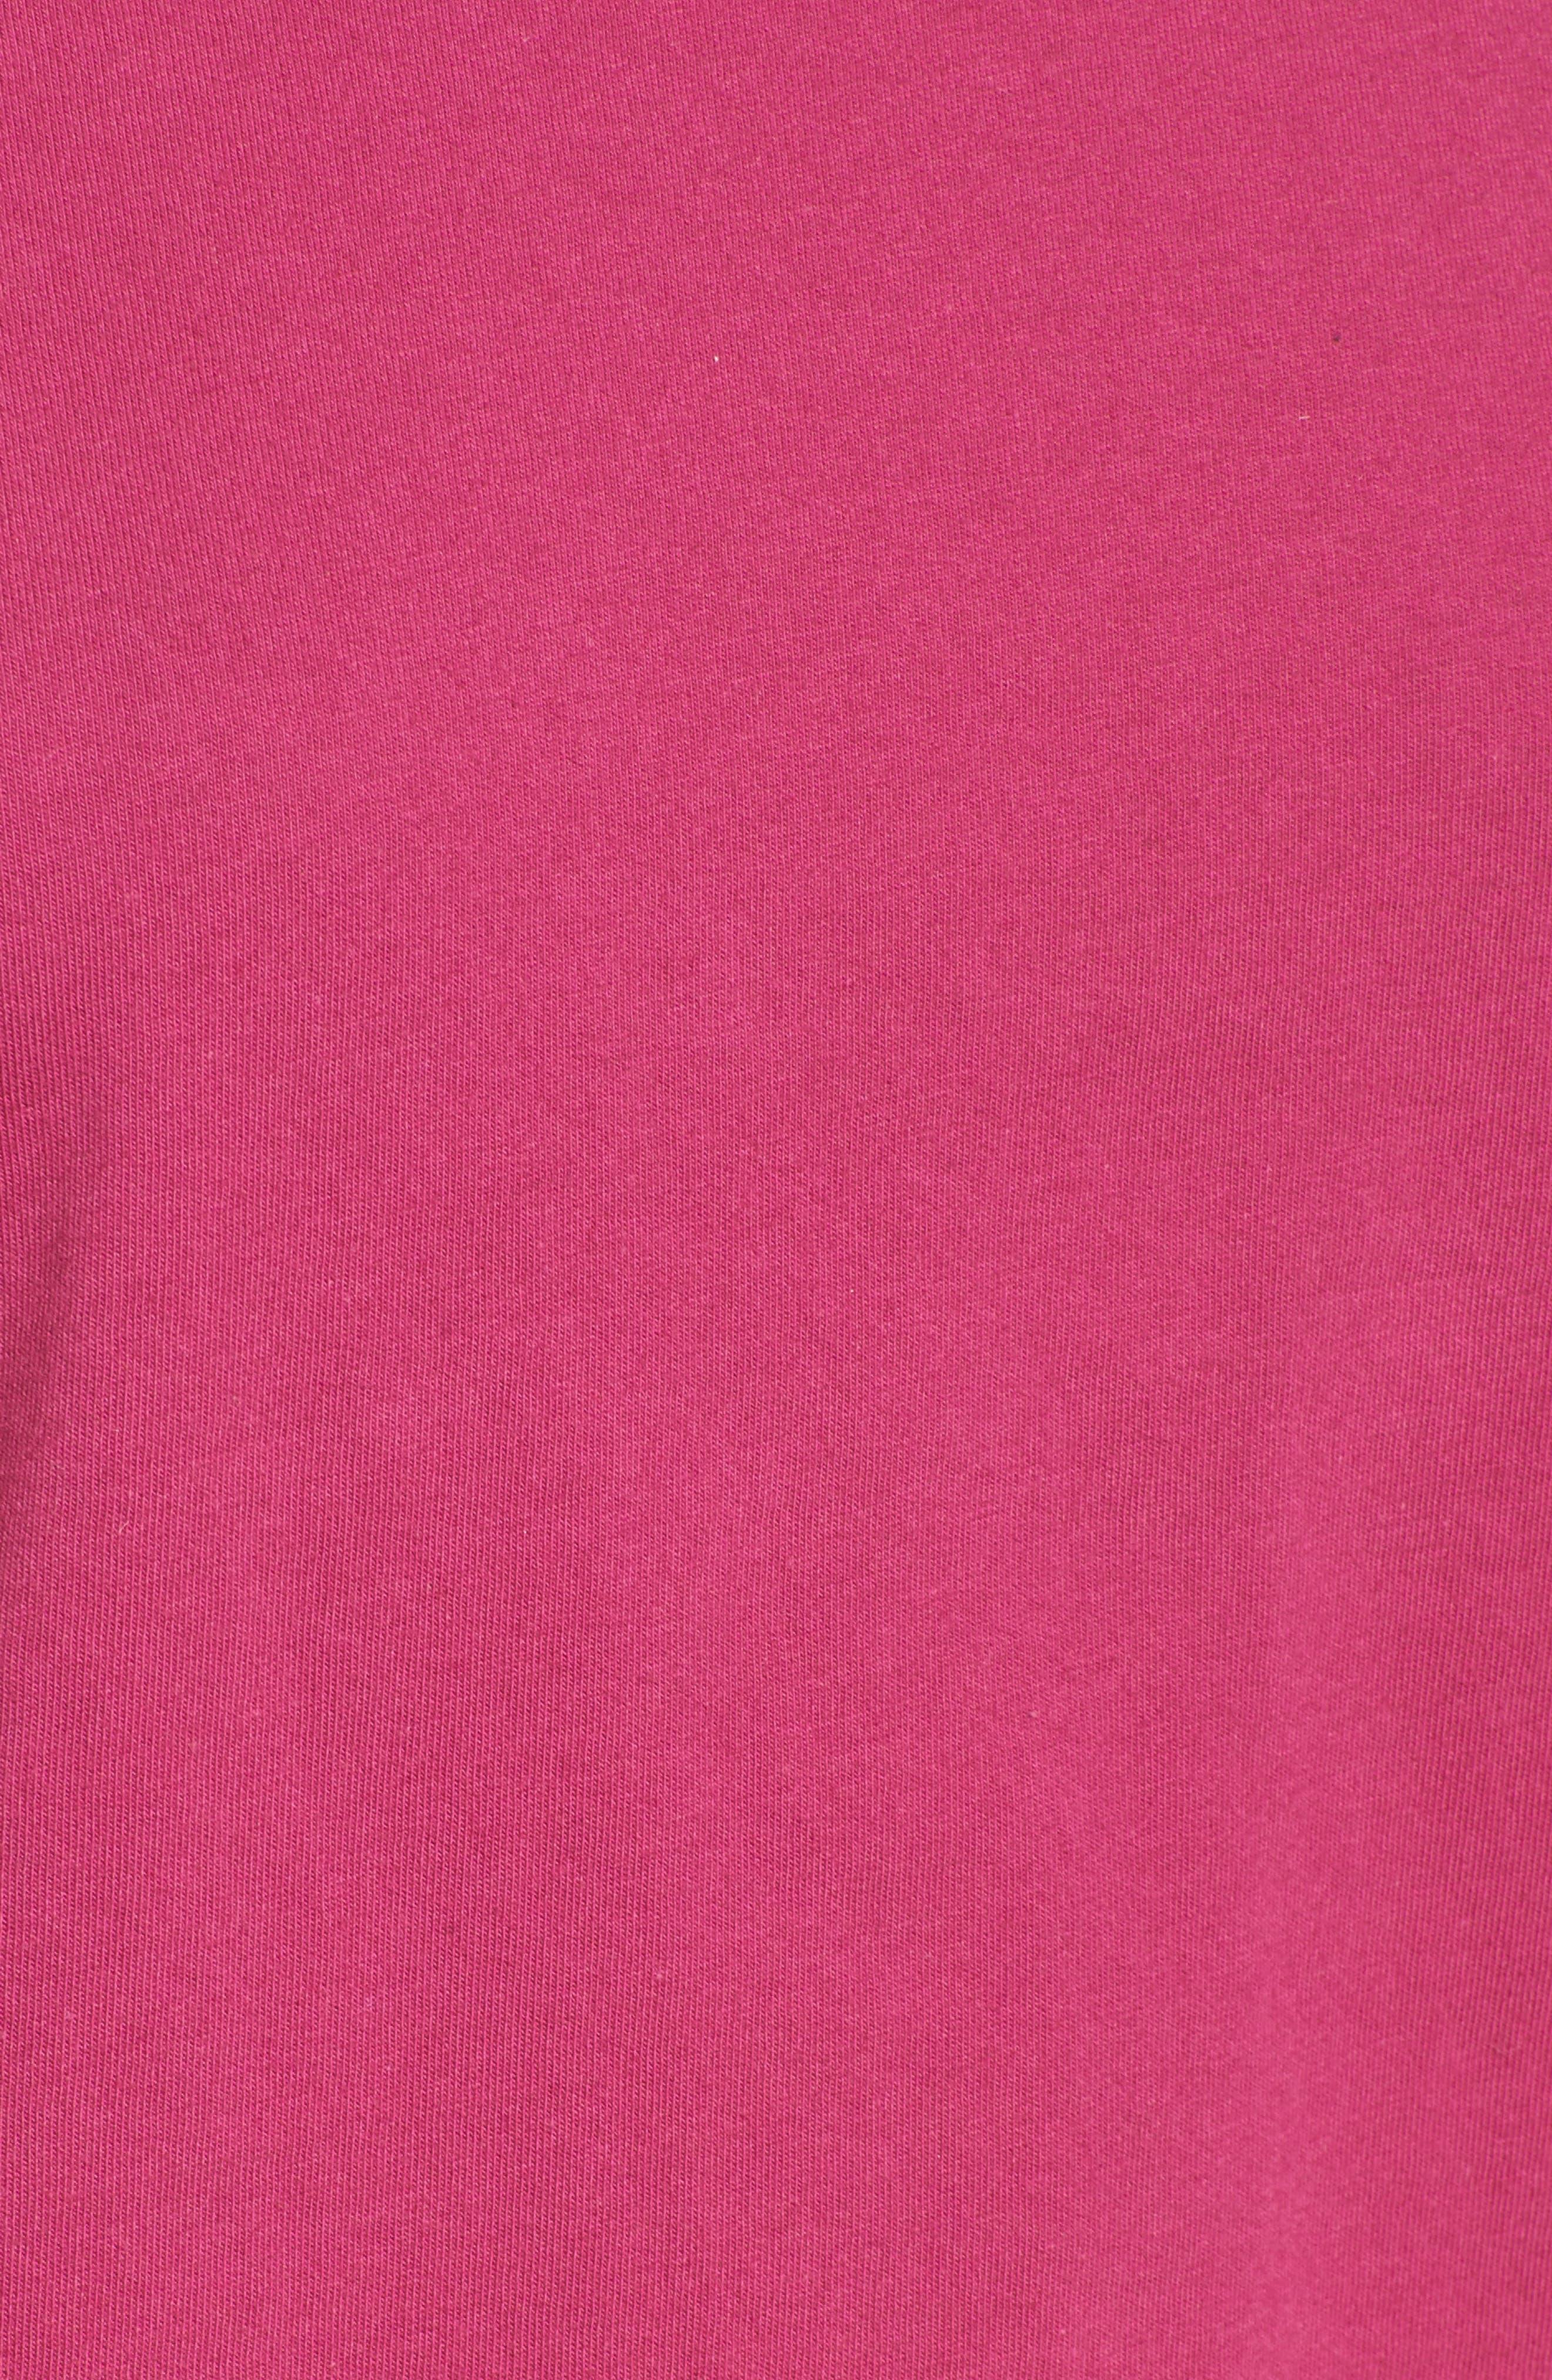 Alternate Image 5  - Halogen® Bow Sleeve Poplin Cotton Top (Regular & Petite)